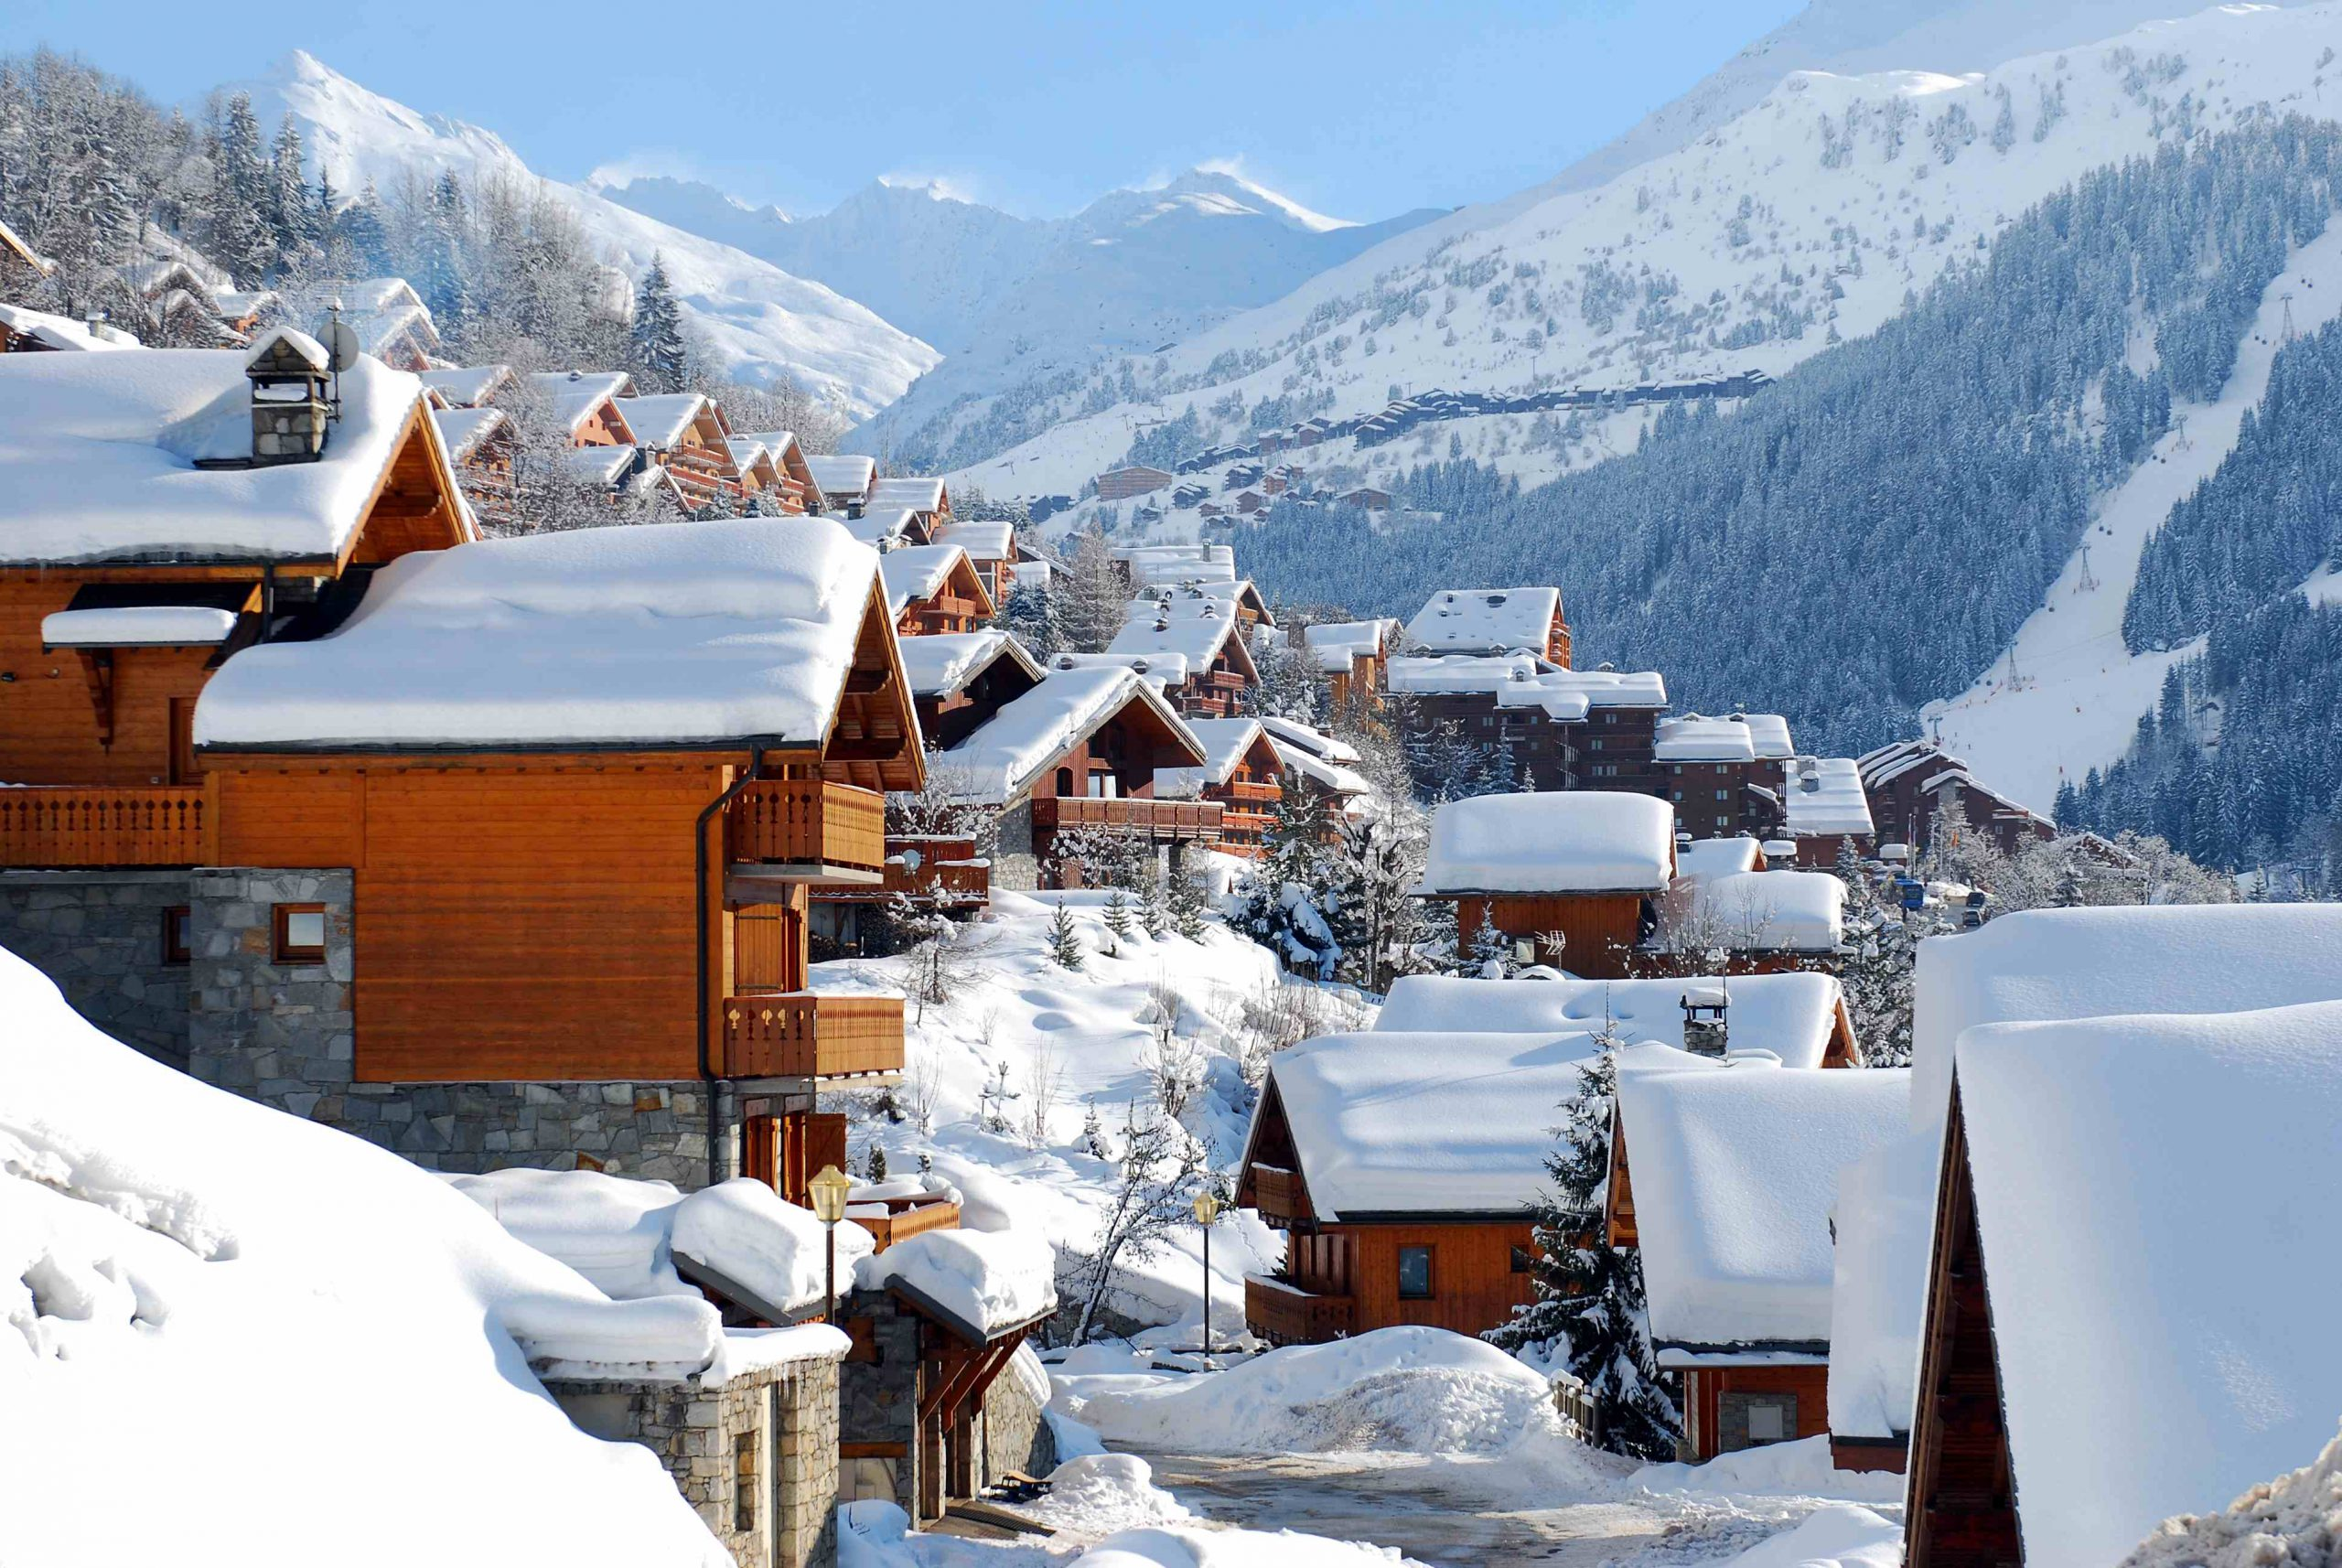 Snow covered chalets in Meribel